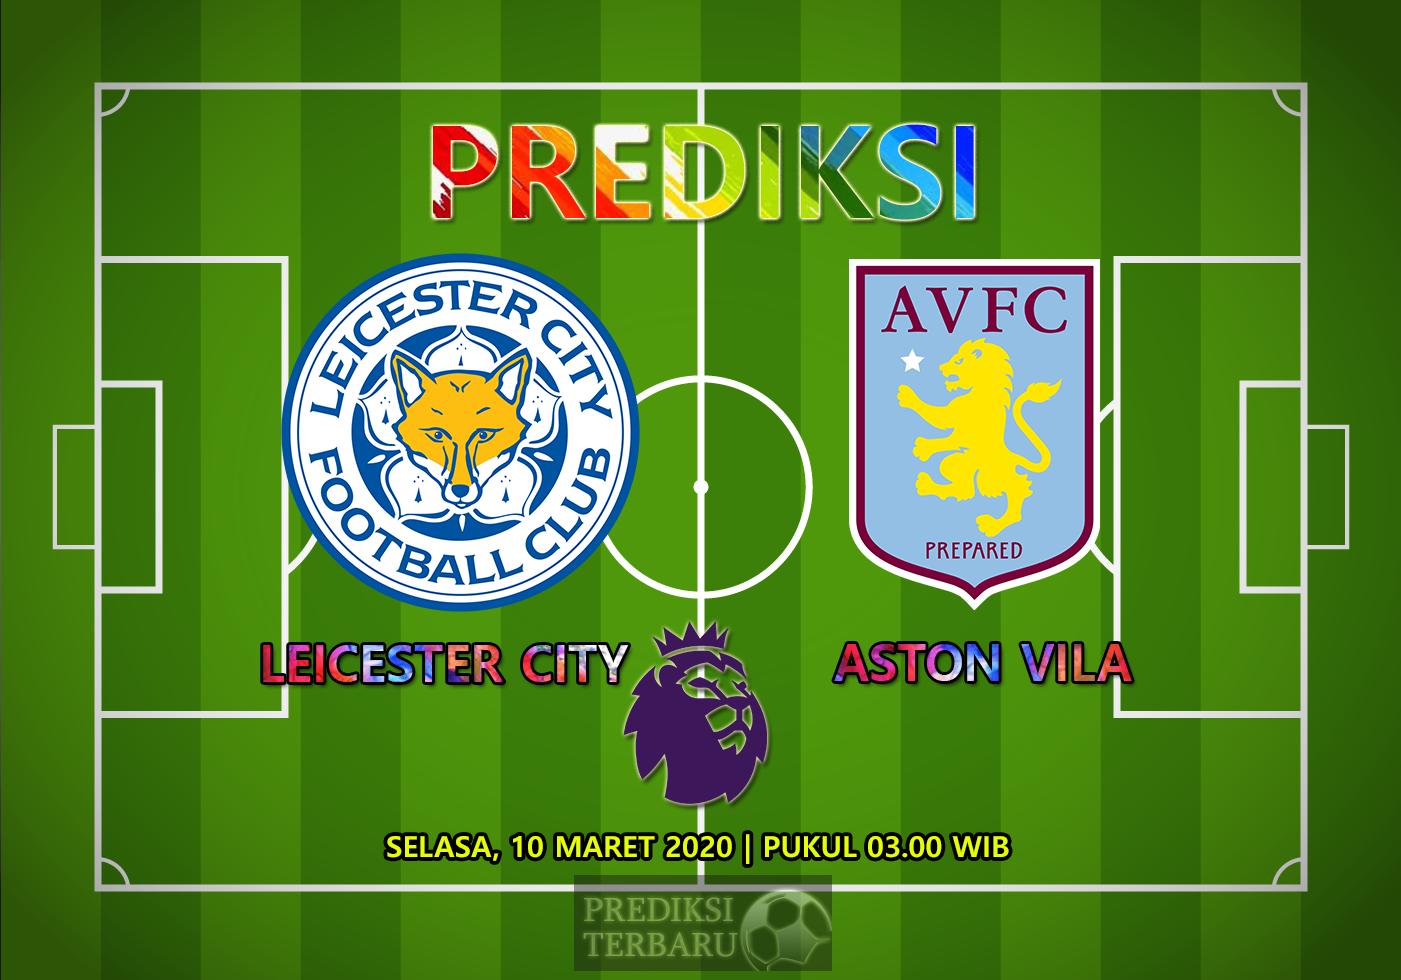 Prediksi Leicester City Vs Aston Vila Selasa 10 Maret